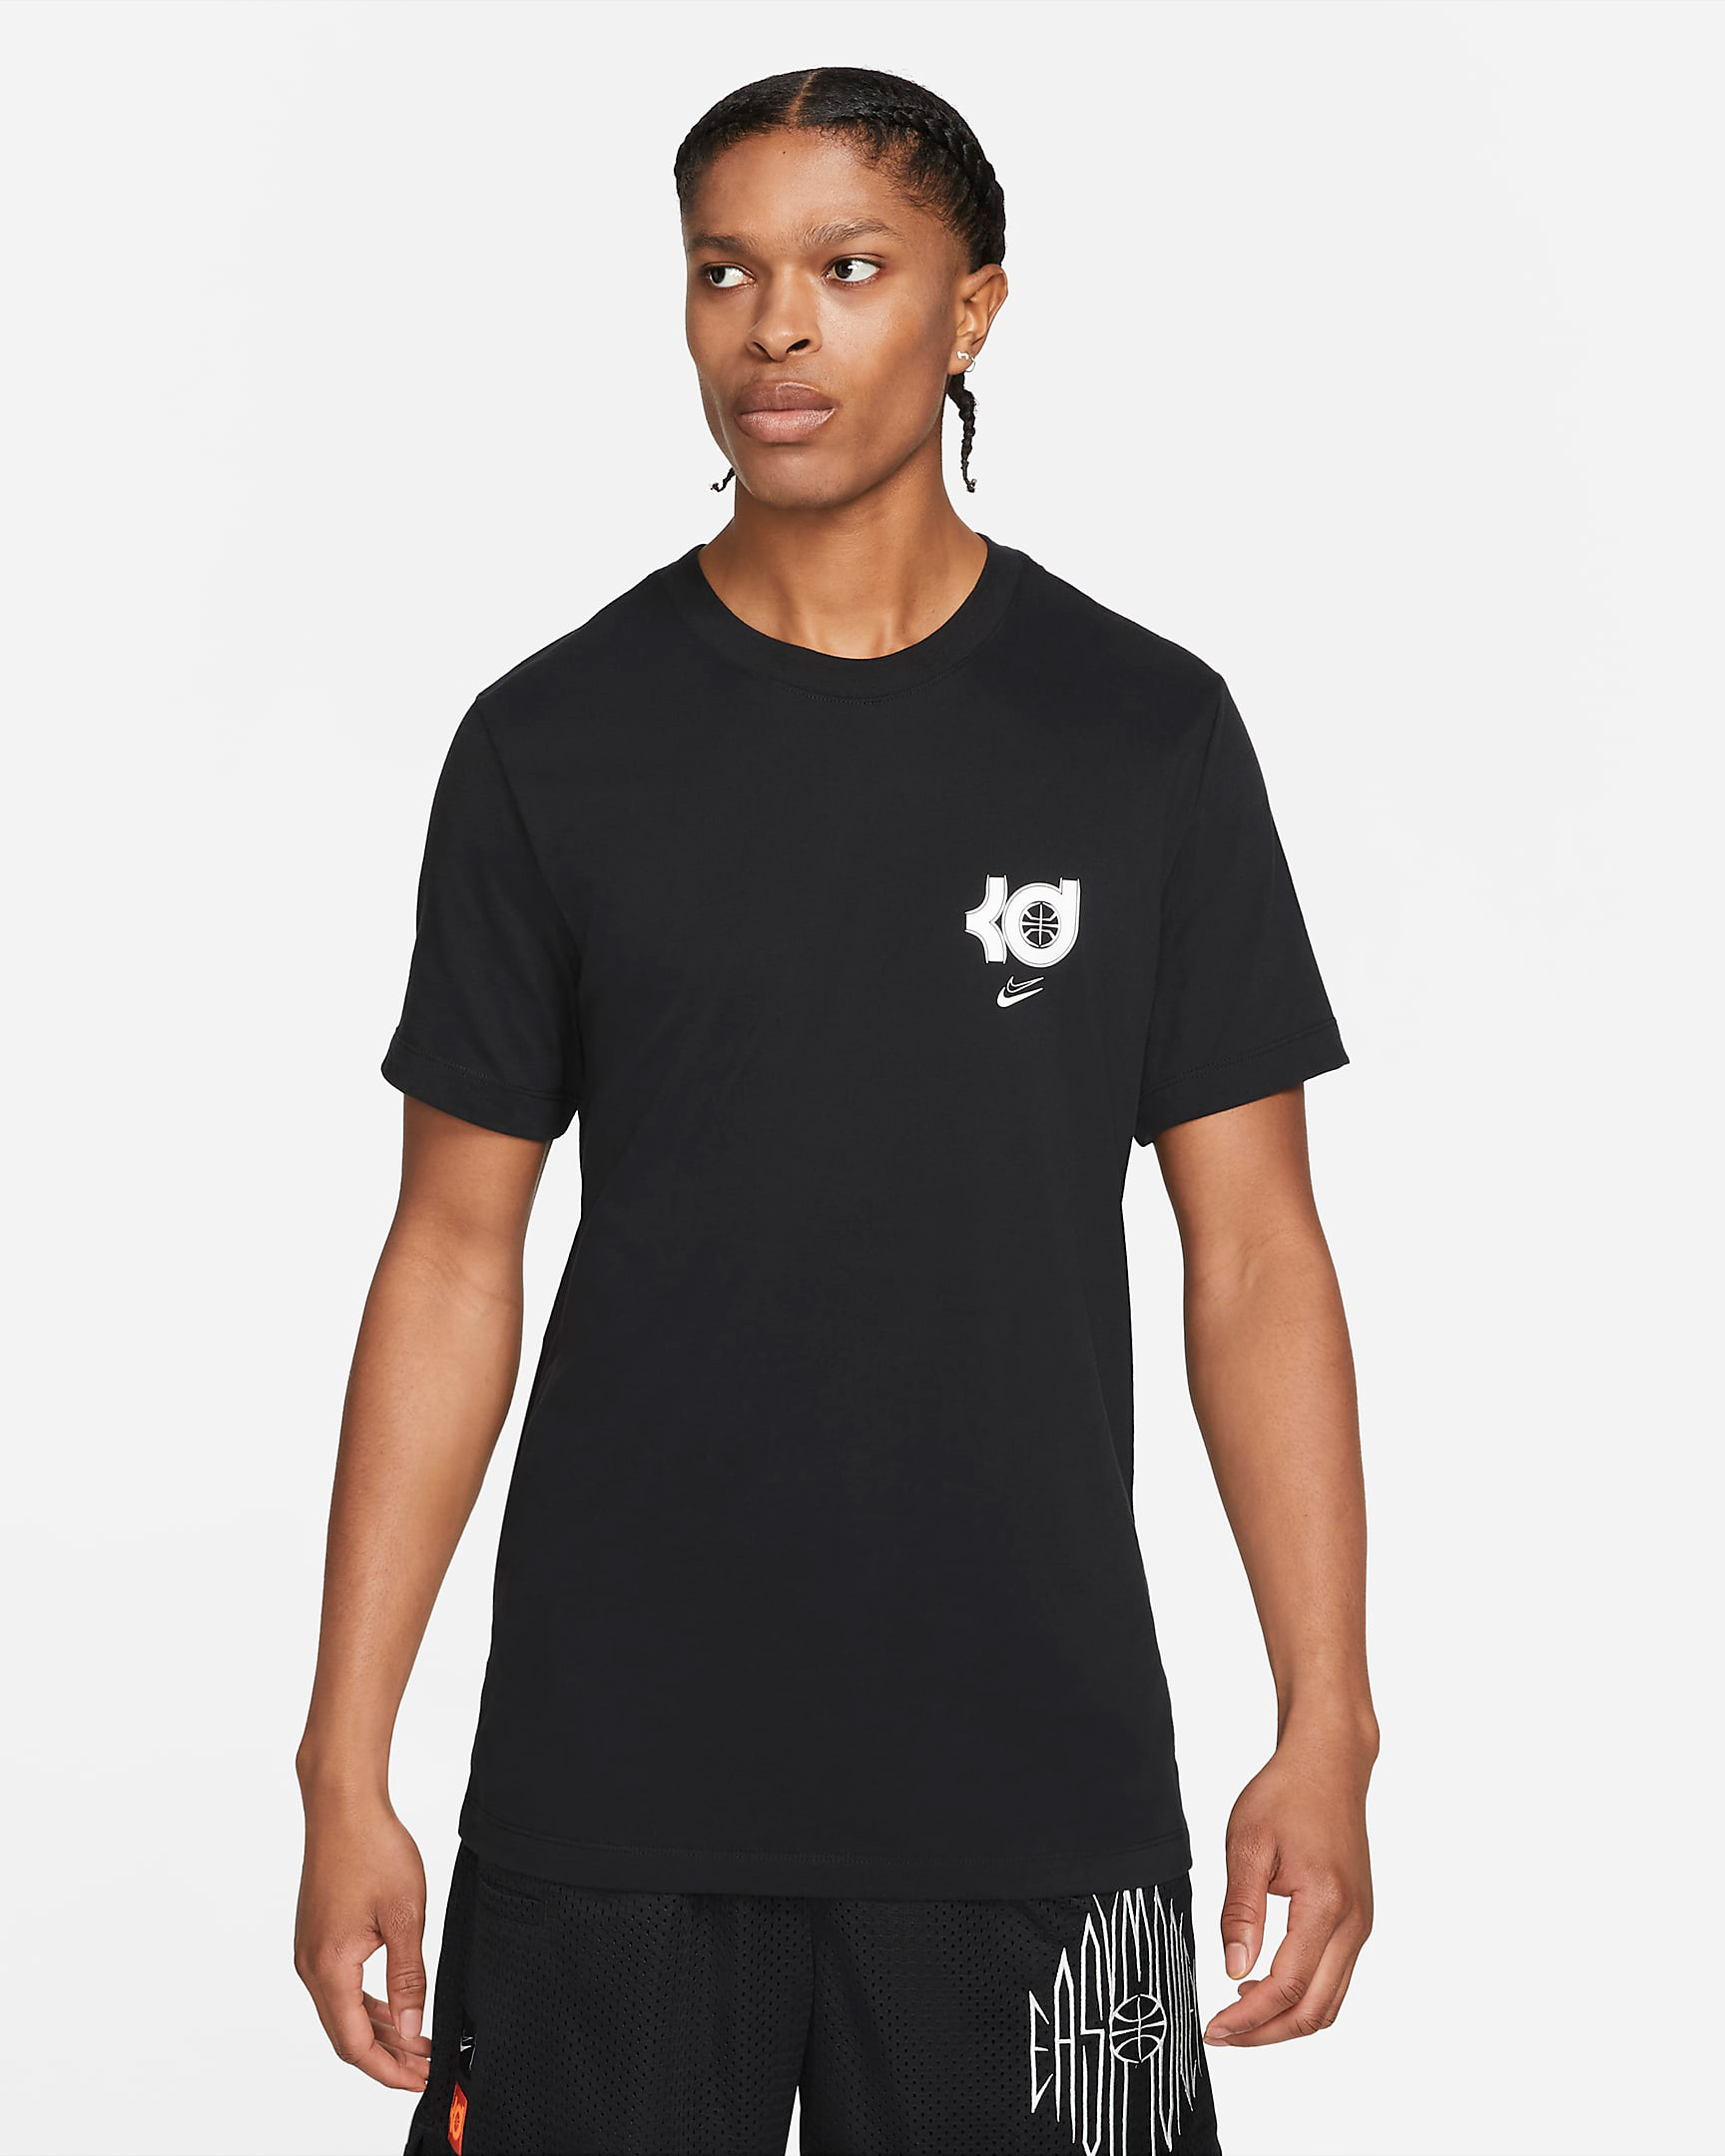 nike-kd-14-shirt-black-white-1